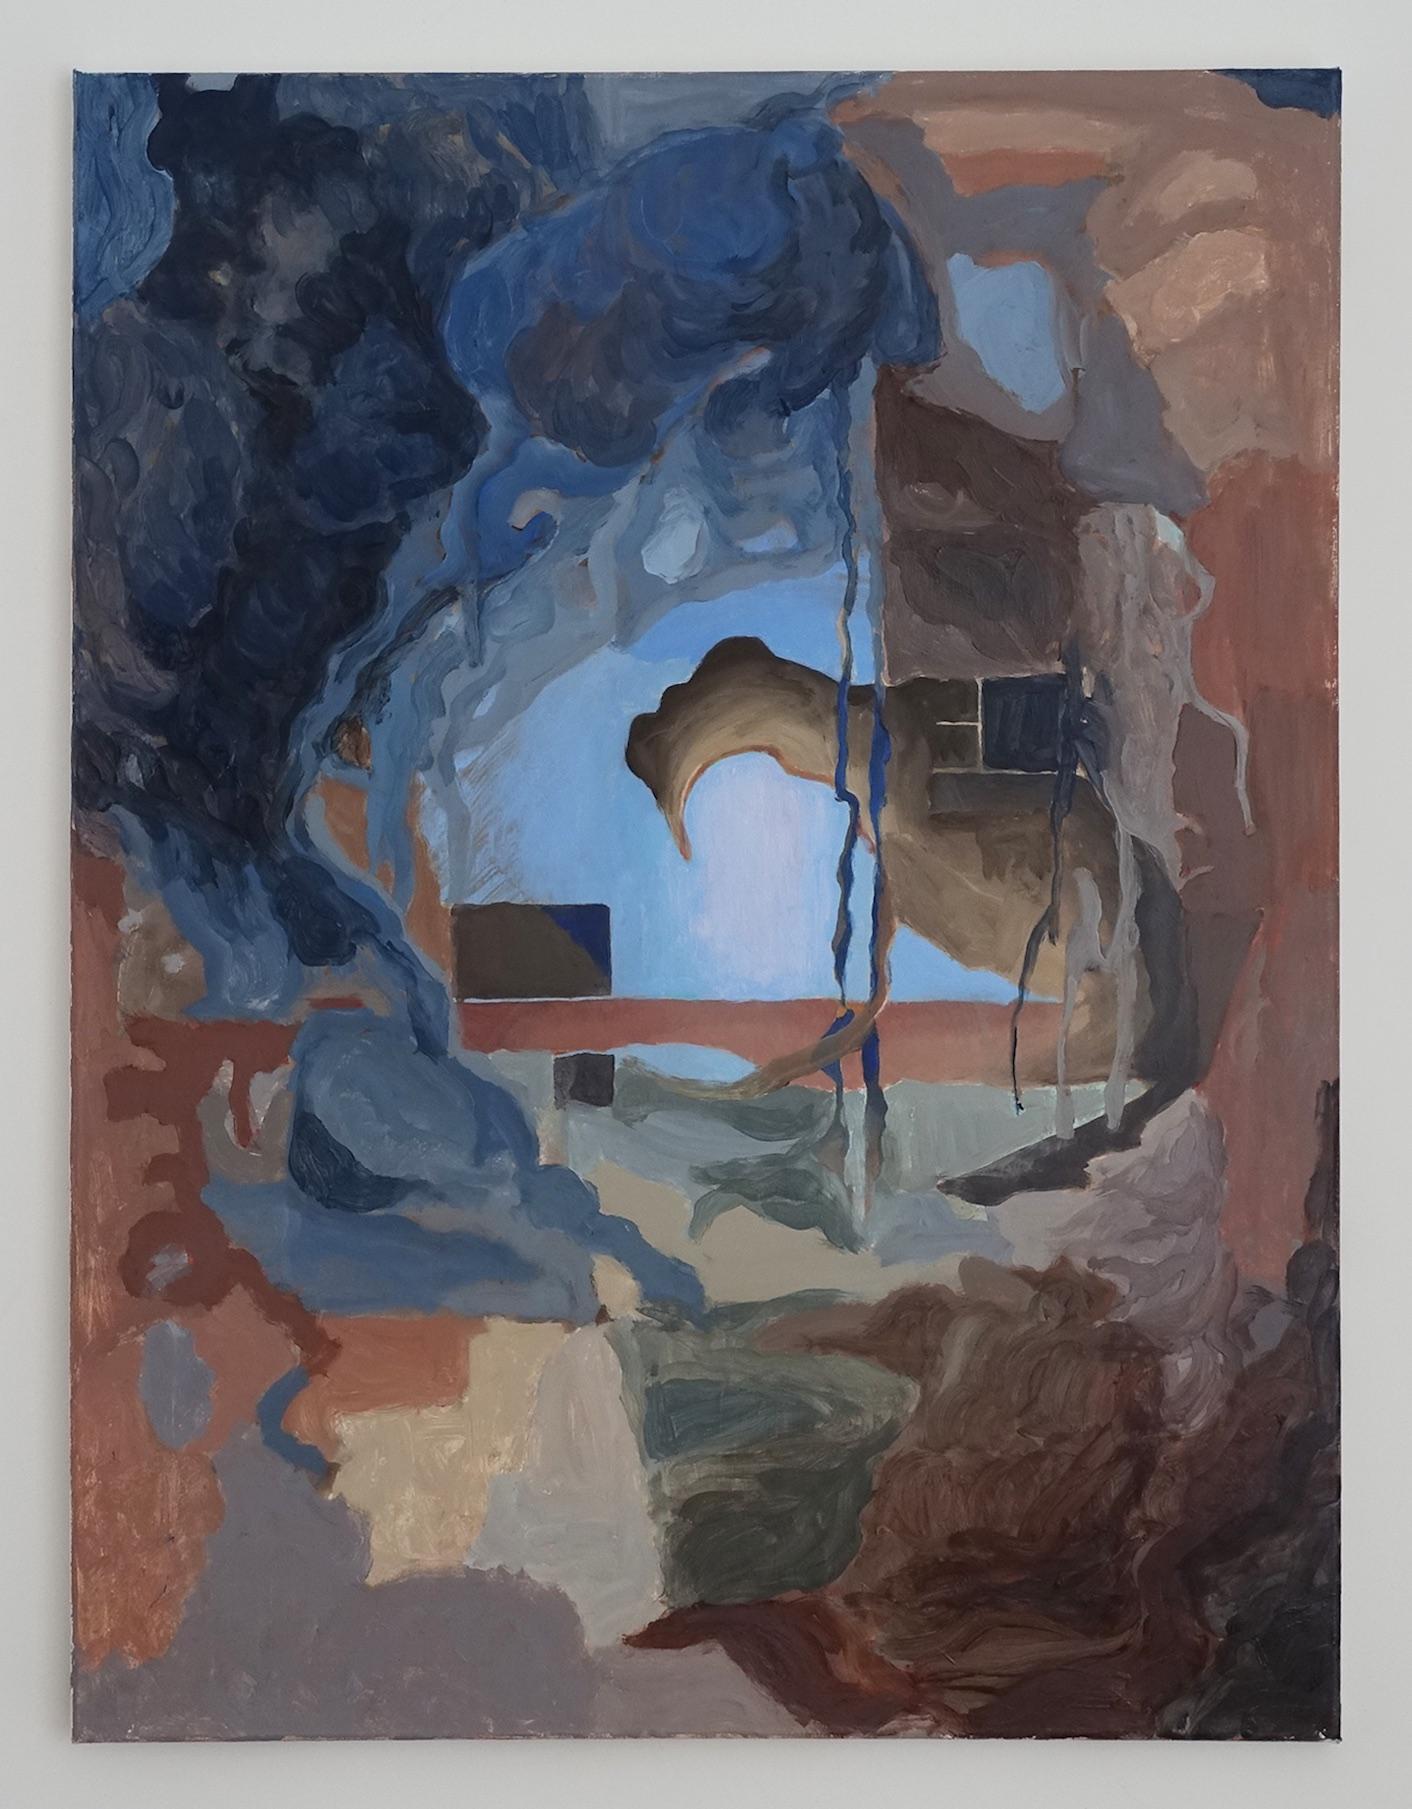 Untitled (Cobalt), 2018